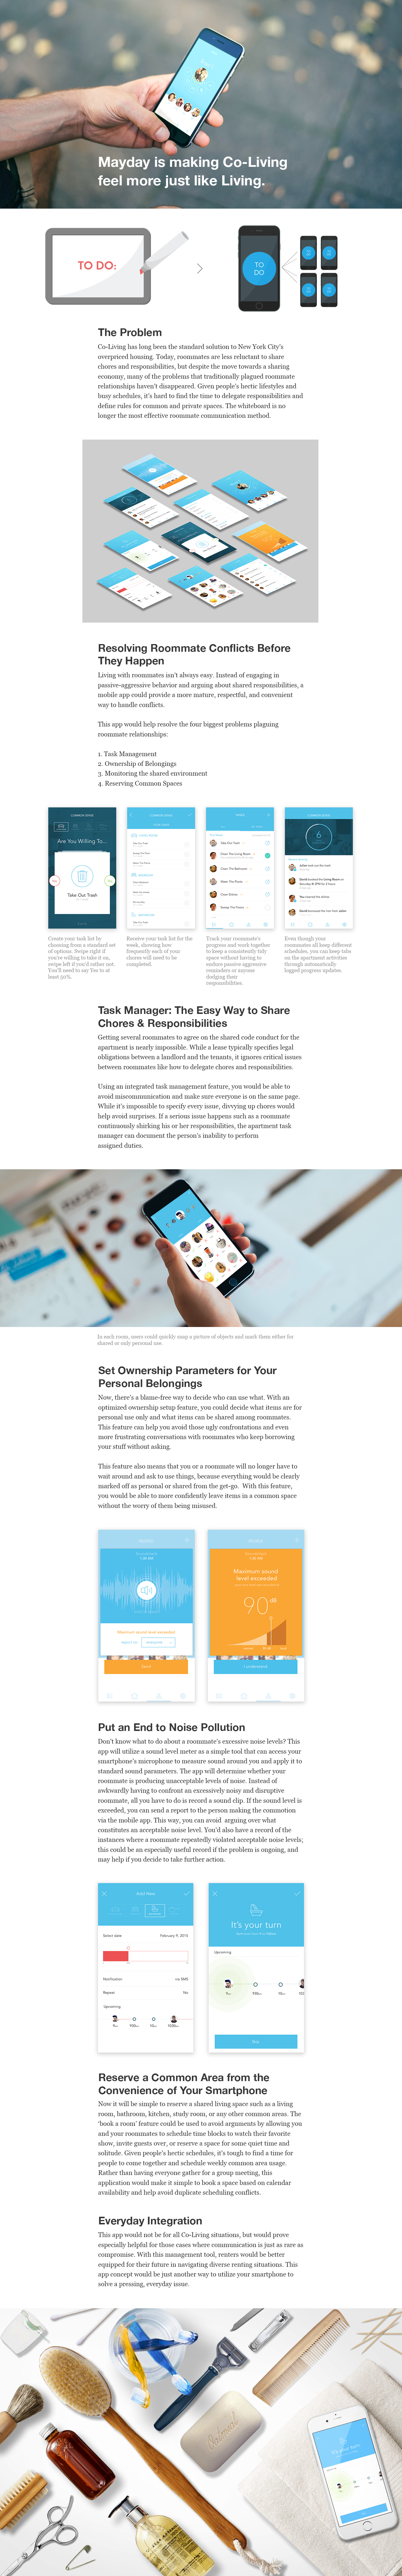 Common-app-medium-revised.jpg